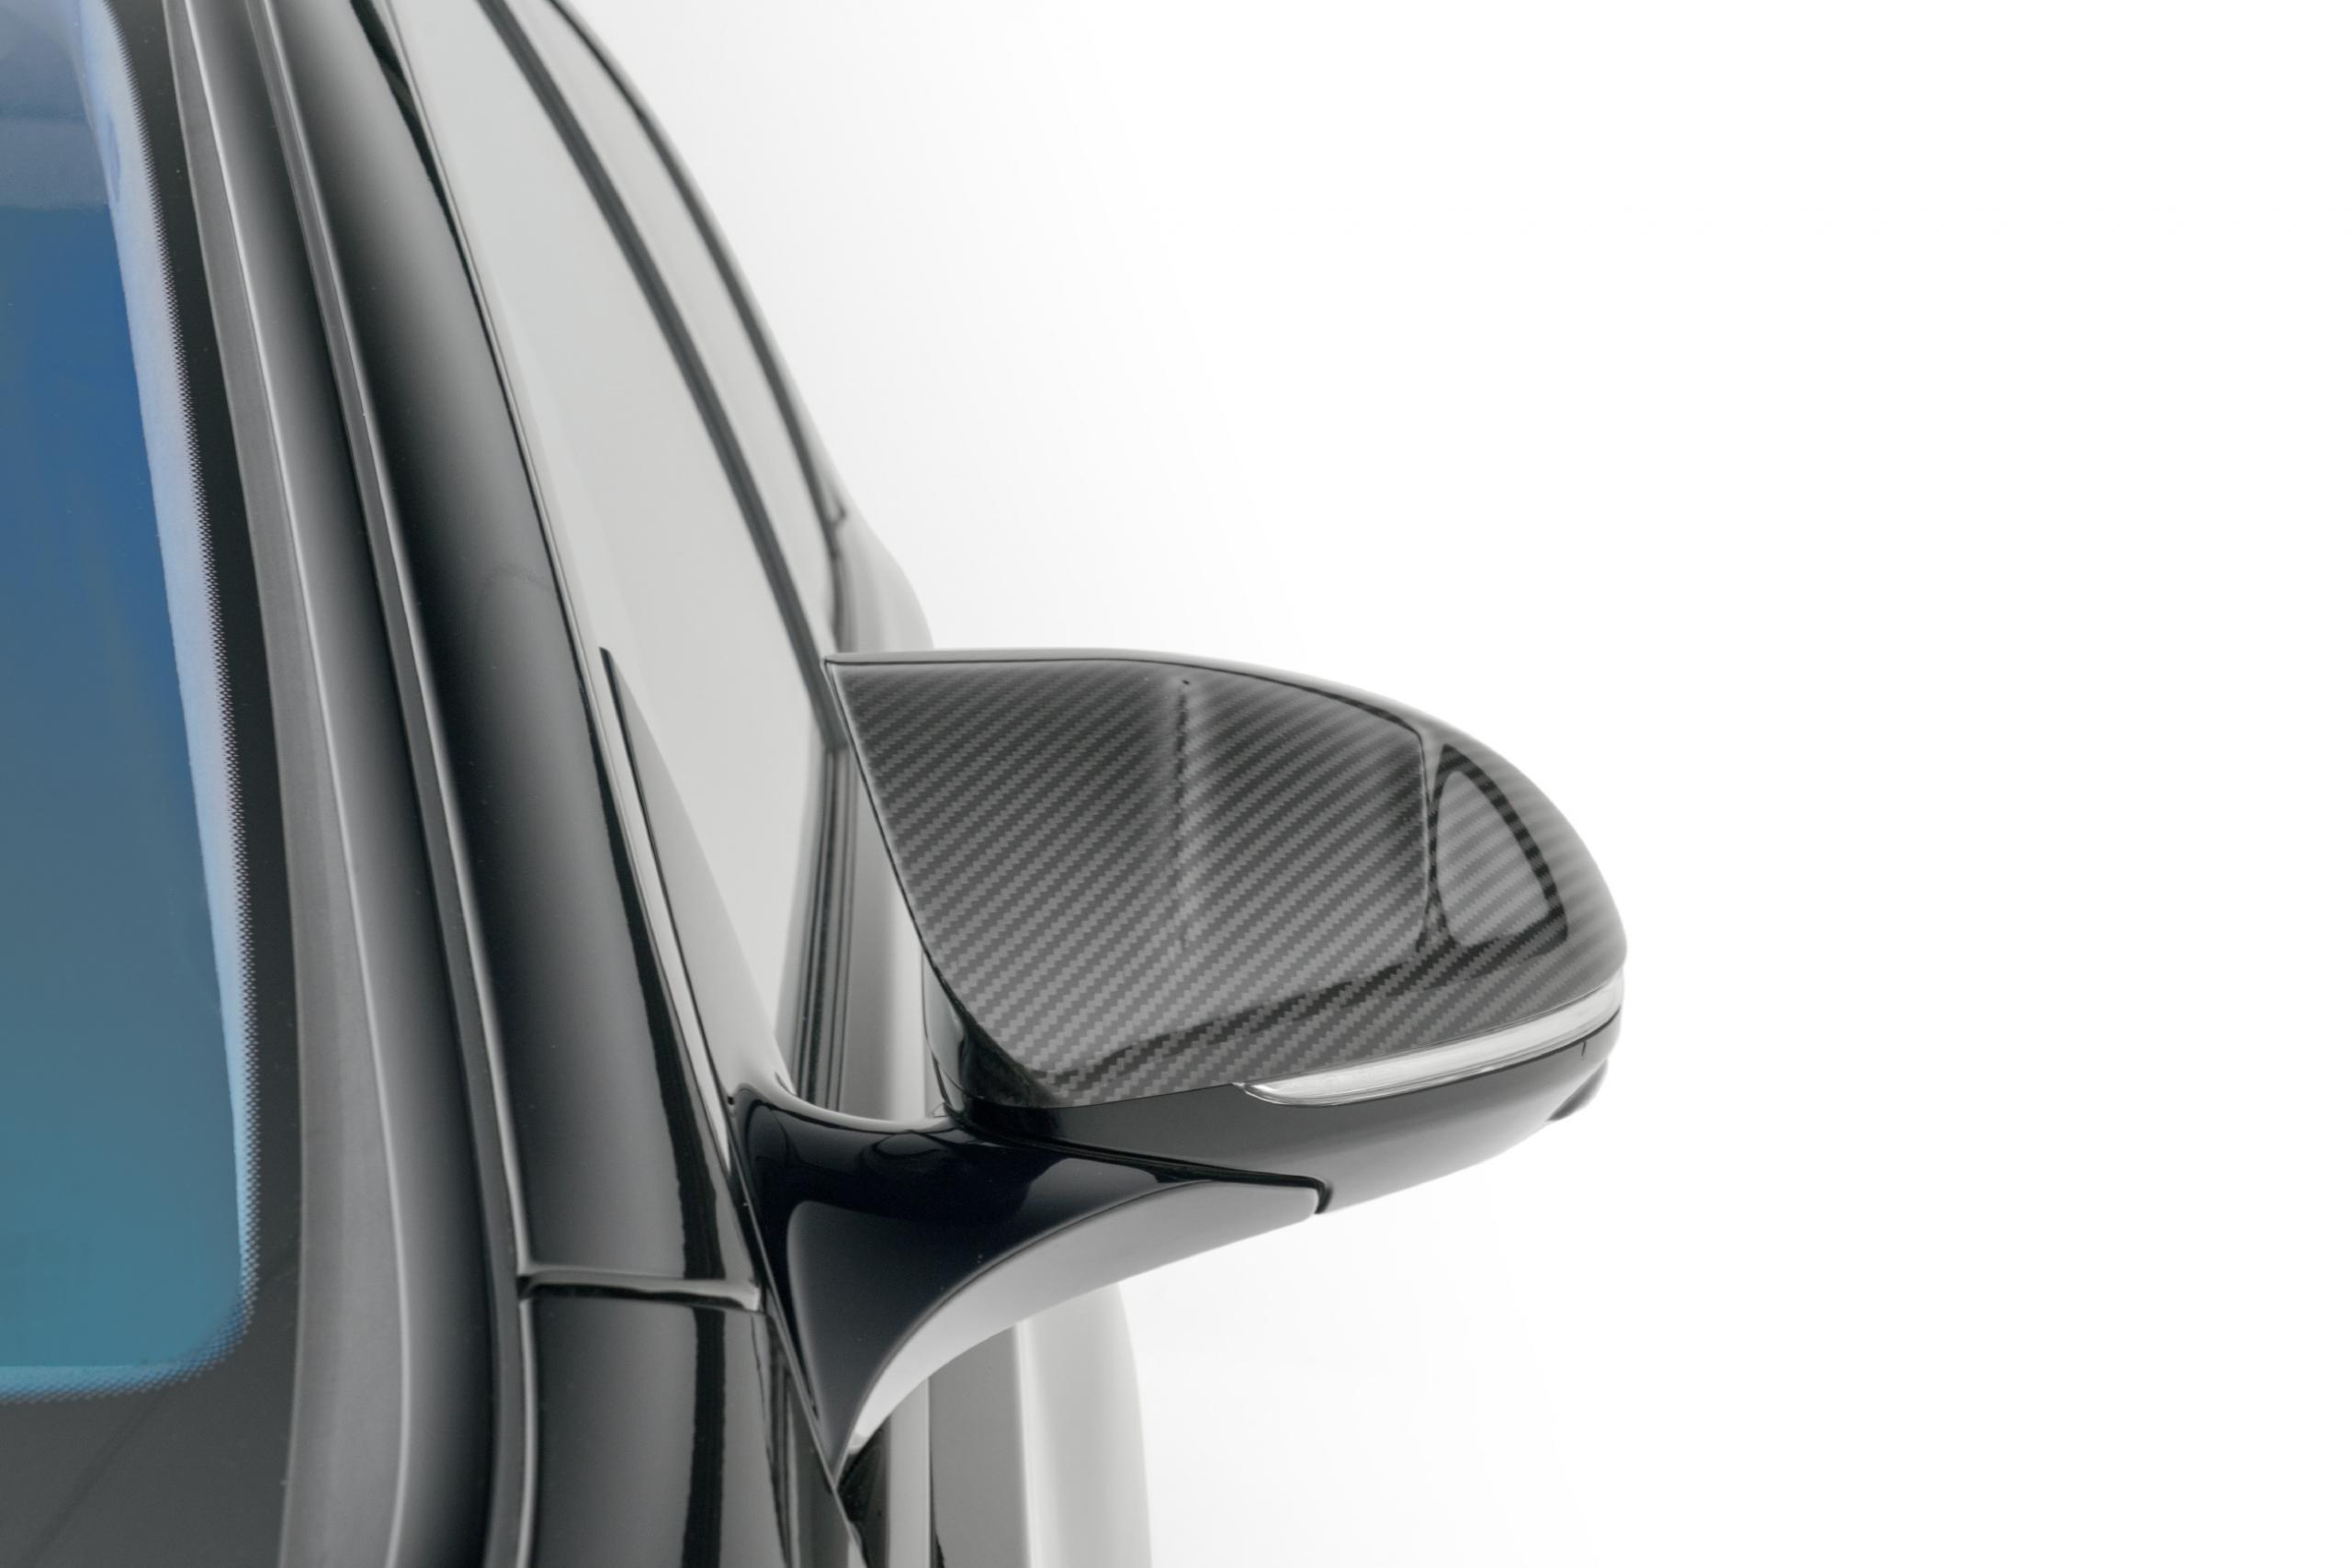 mansory w223 mercedes s class body kit carbon fiber mirror II 2 cover 2021 2022 2023